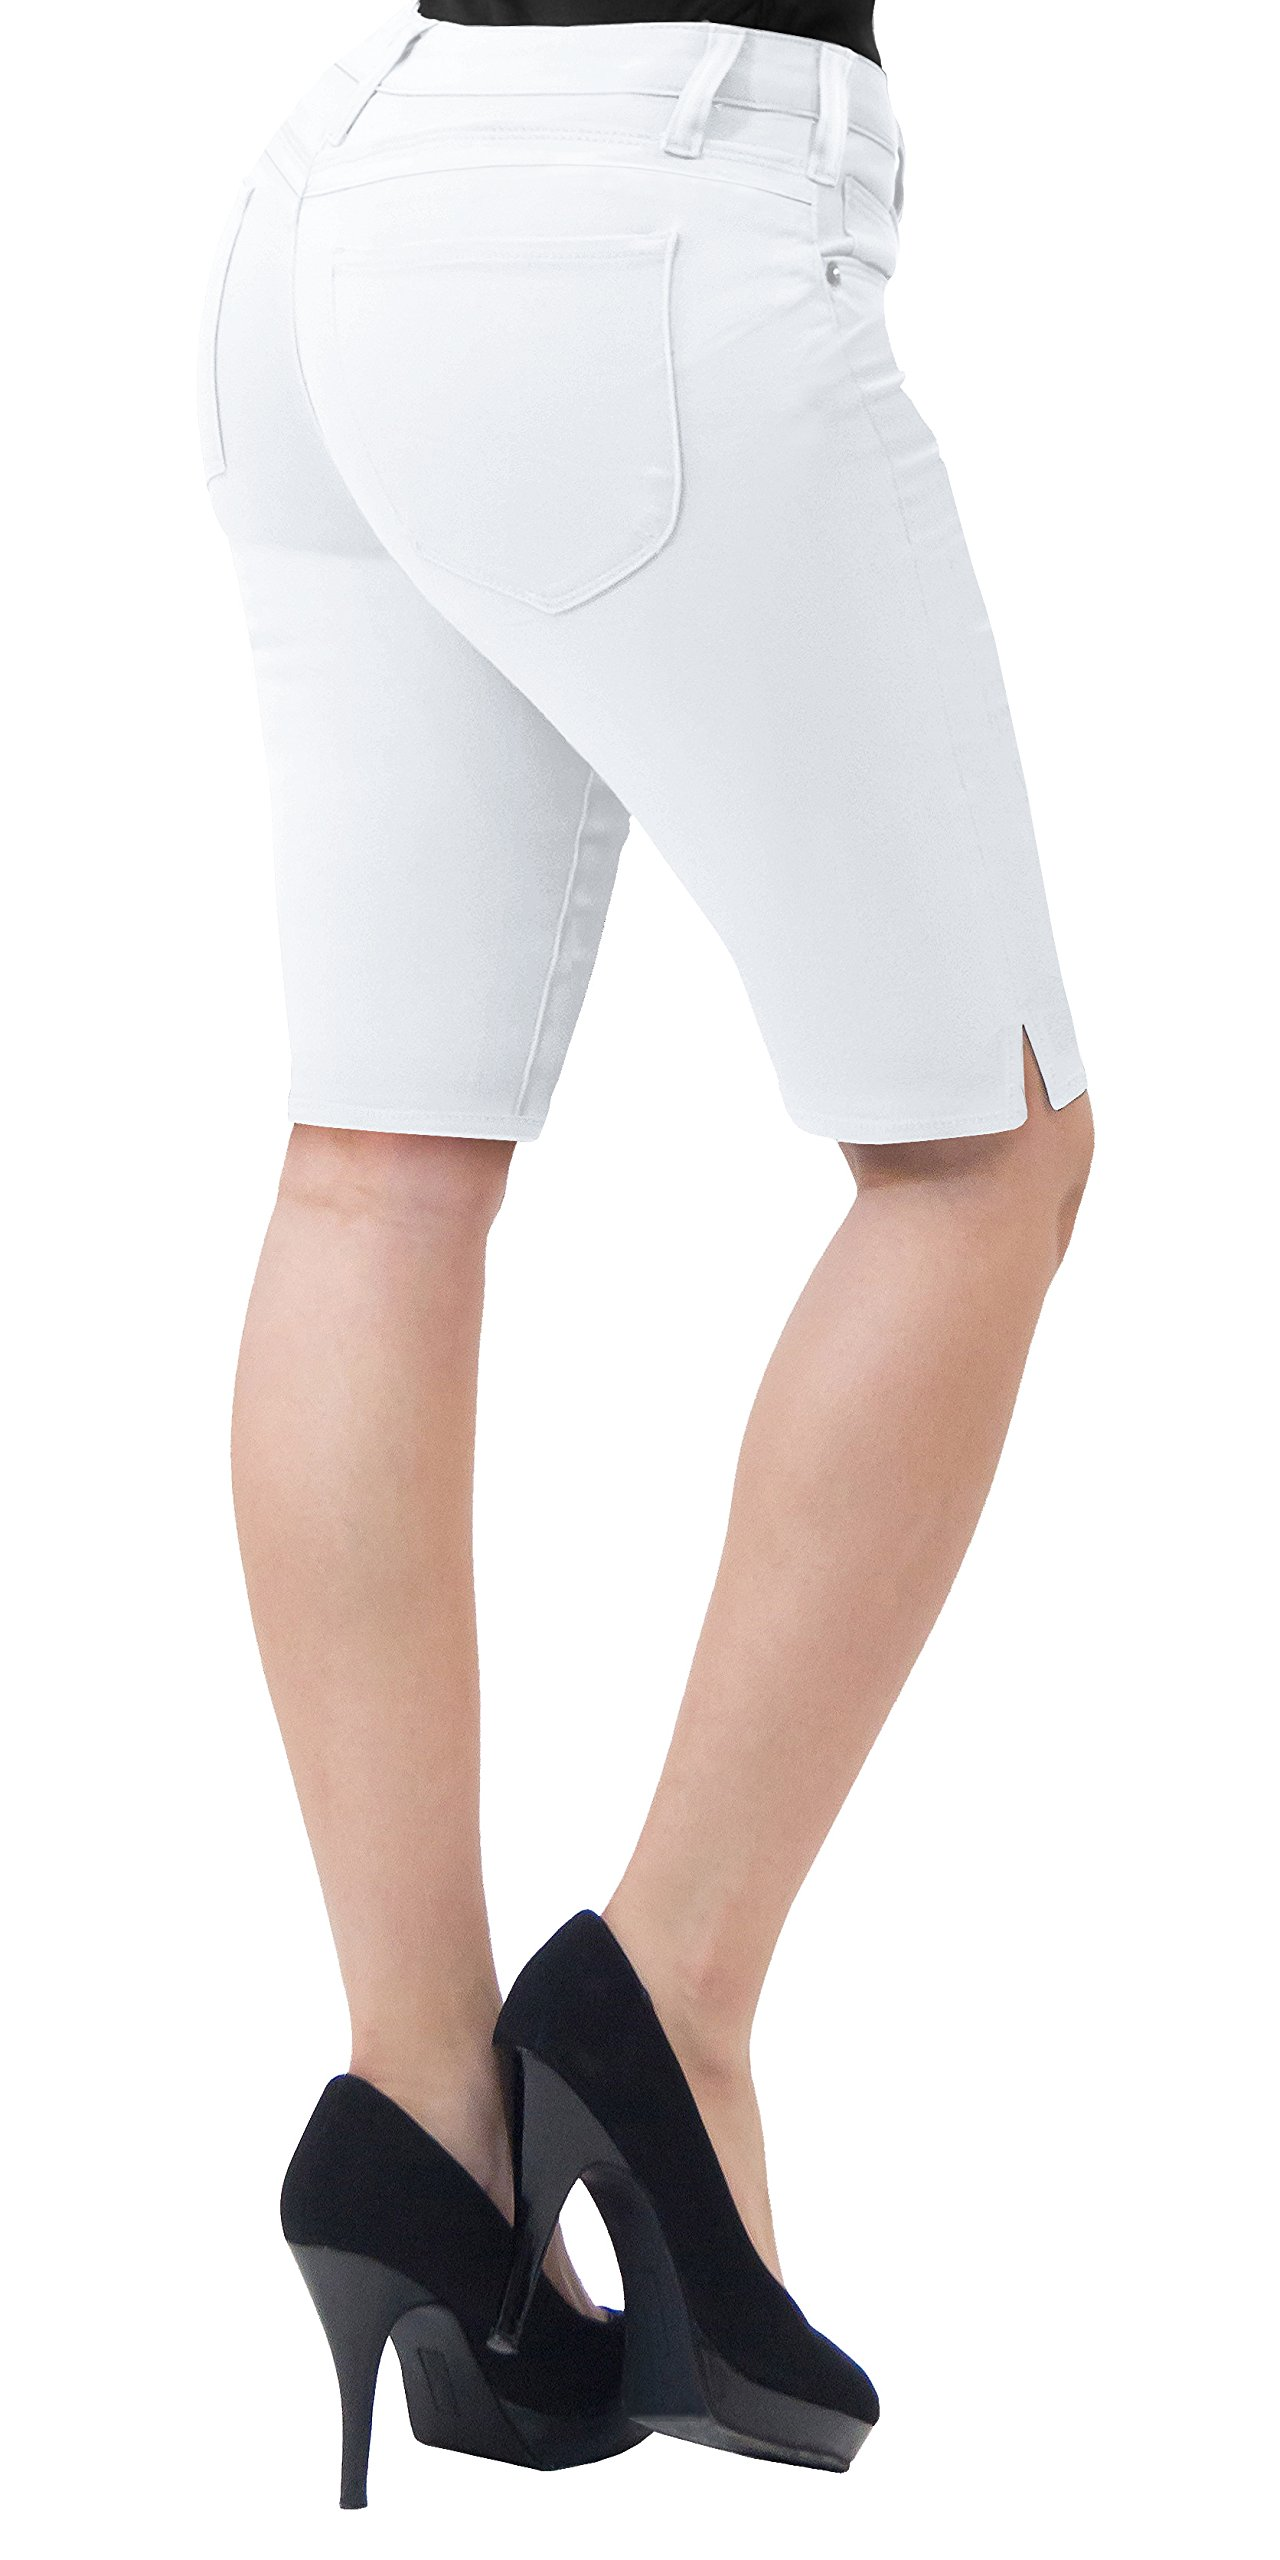 HyBrid & Company Women's Stretchy Denim Bermuda ShortB19411X White 16